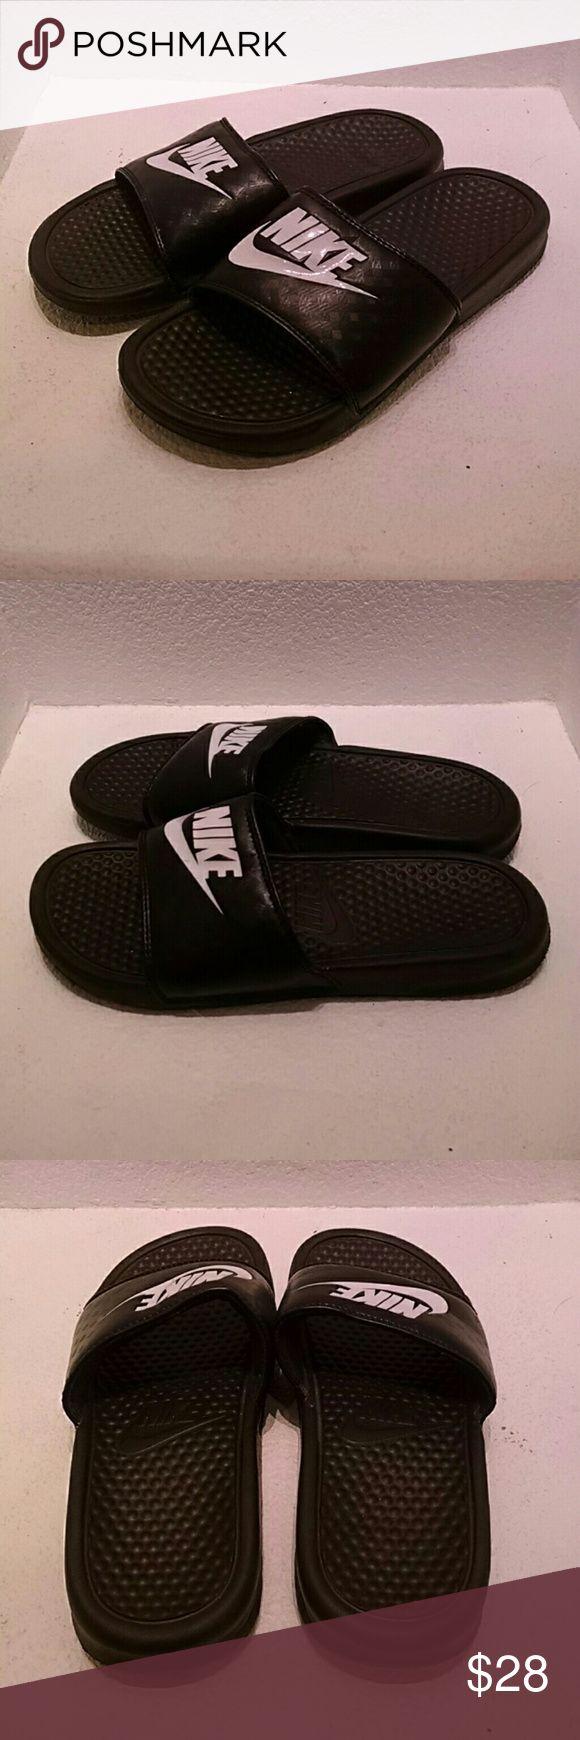 Nike Sandals Men's Size 8 Nike men's sandals size 8. Upper sandals in excellent condition and soles are excellent showing no noticable wear. Nike Shoes Sandals & Flip-Flops